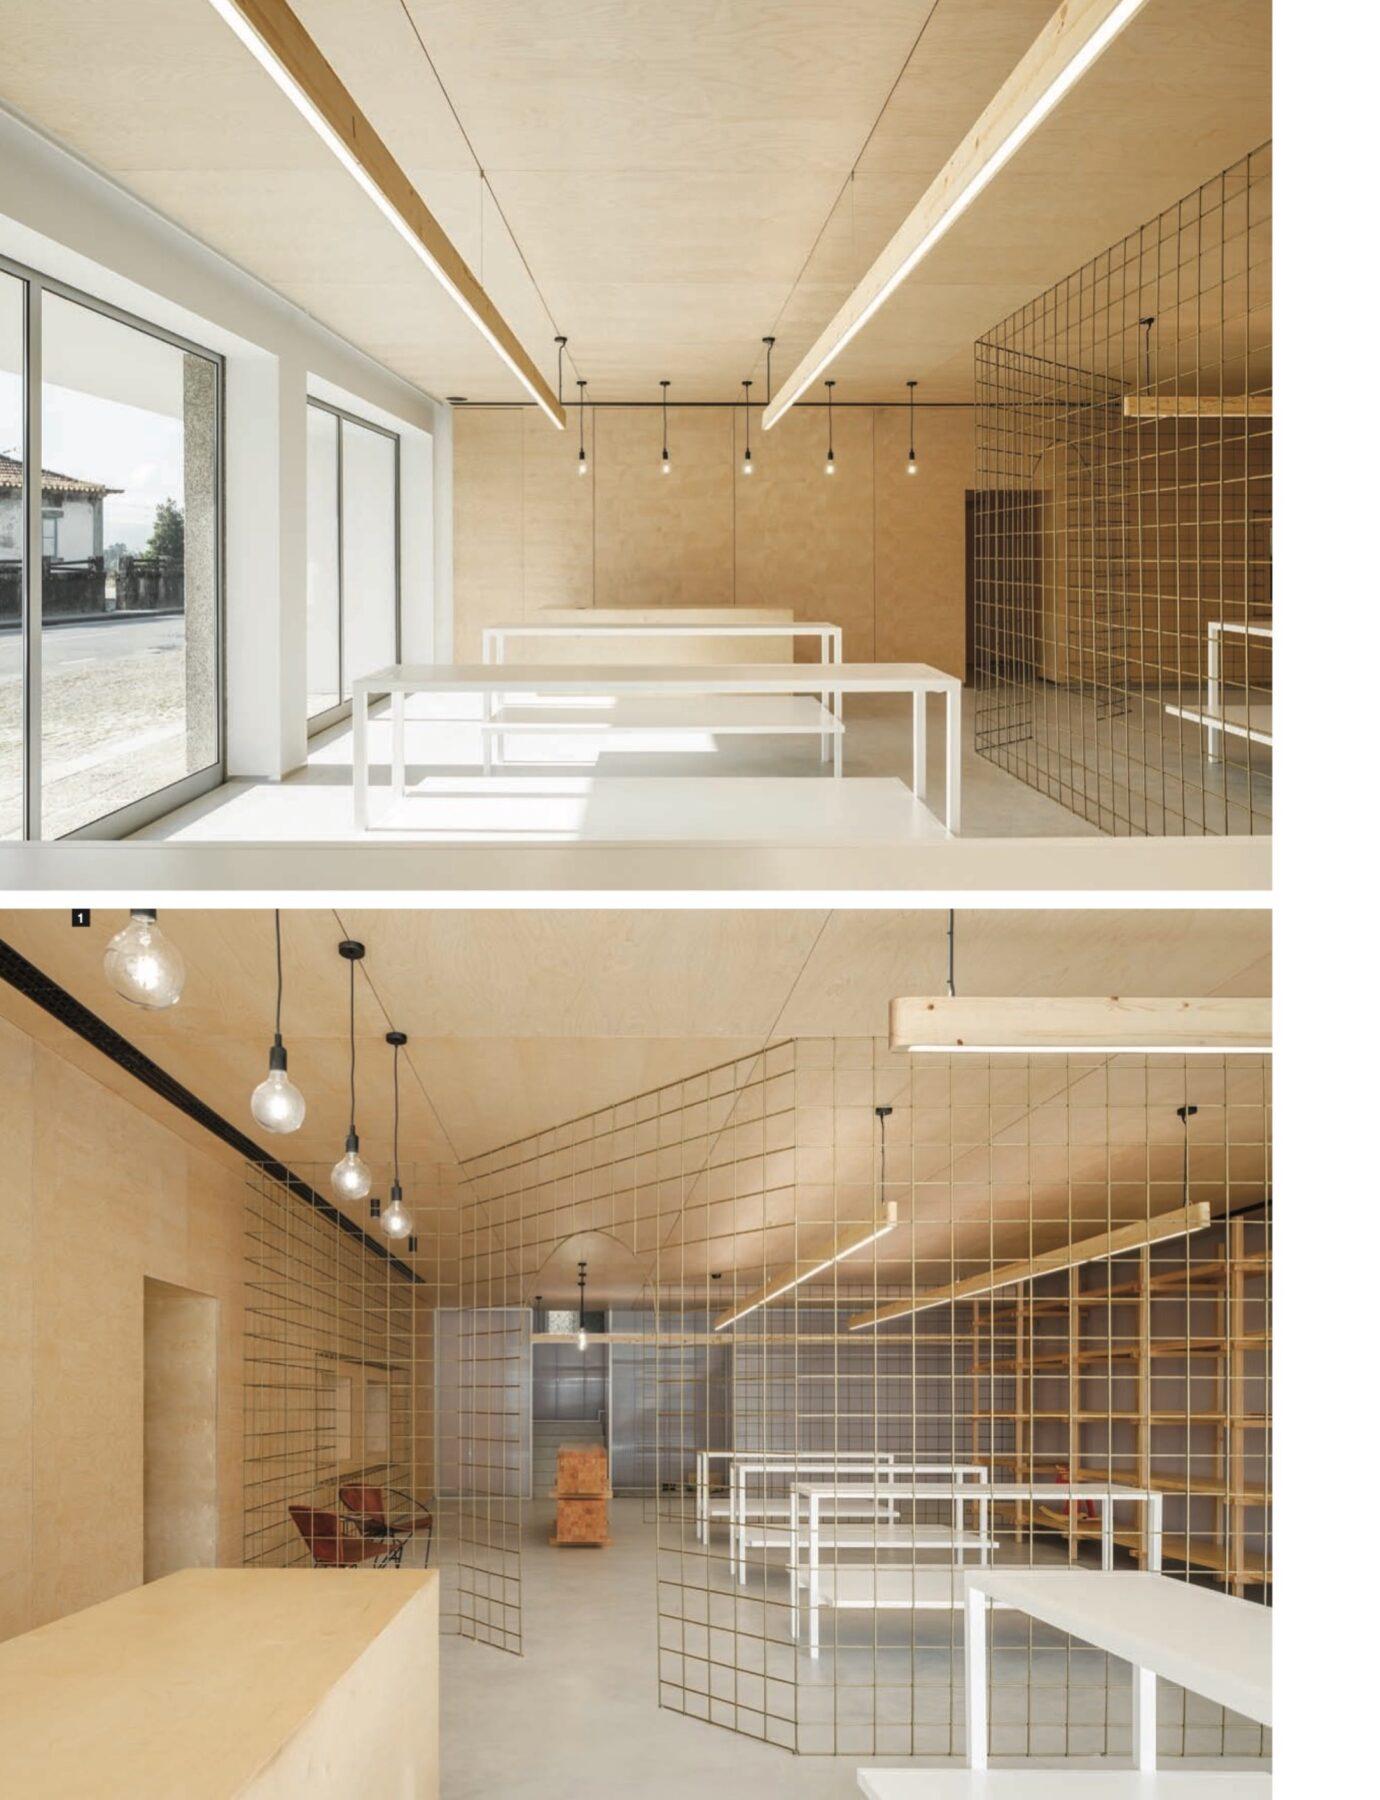 interiors korea studere aramazens morinha 413 3 3